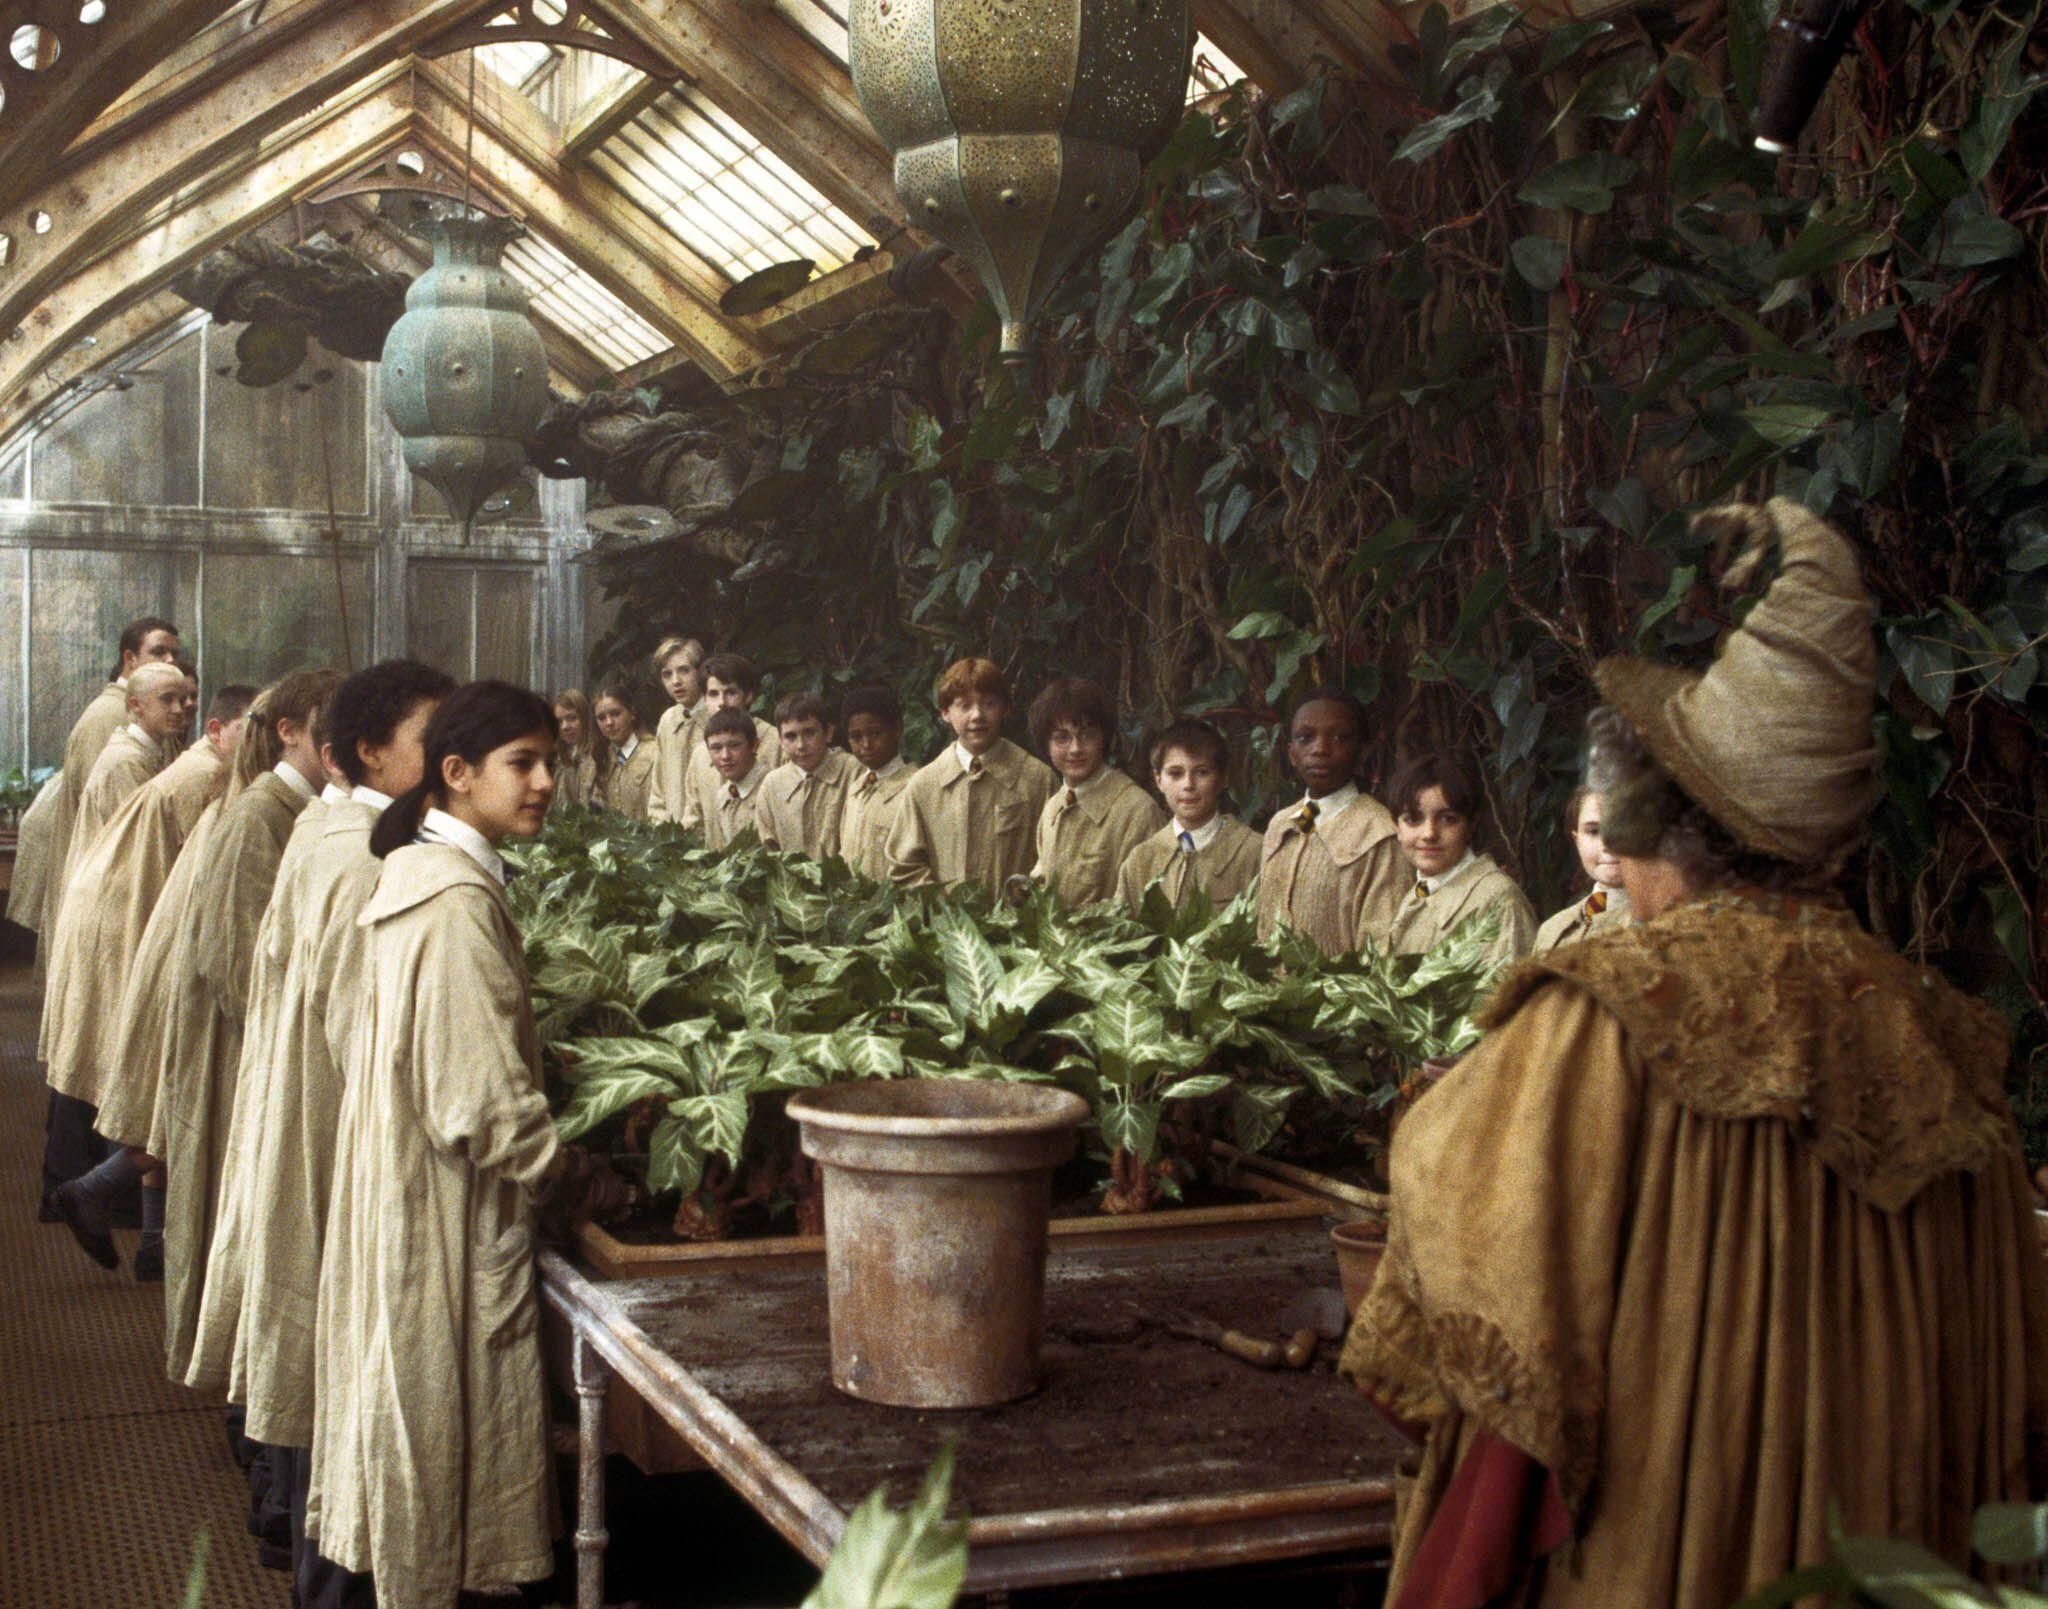 Repotting Mandrakes